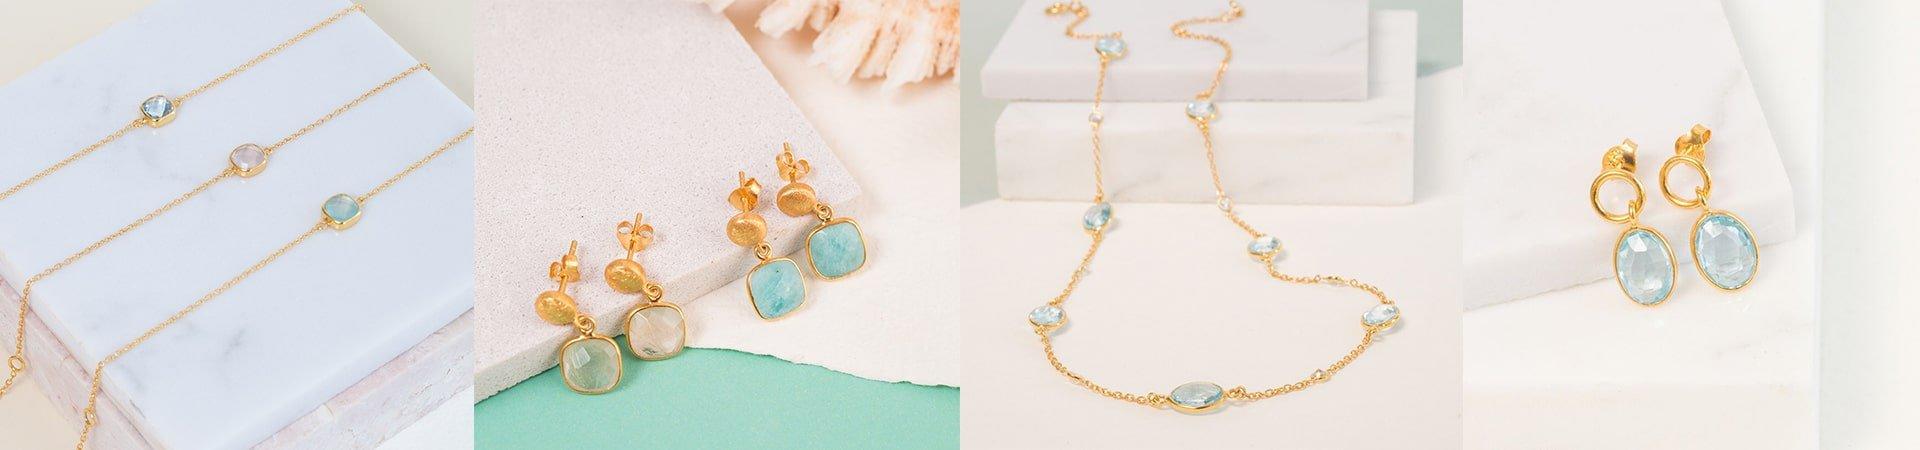 Shop Auree Jewellery